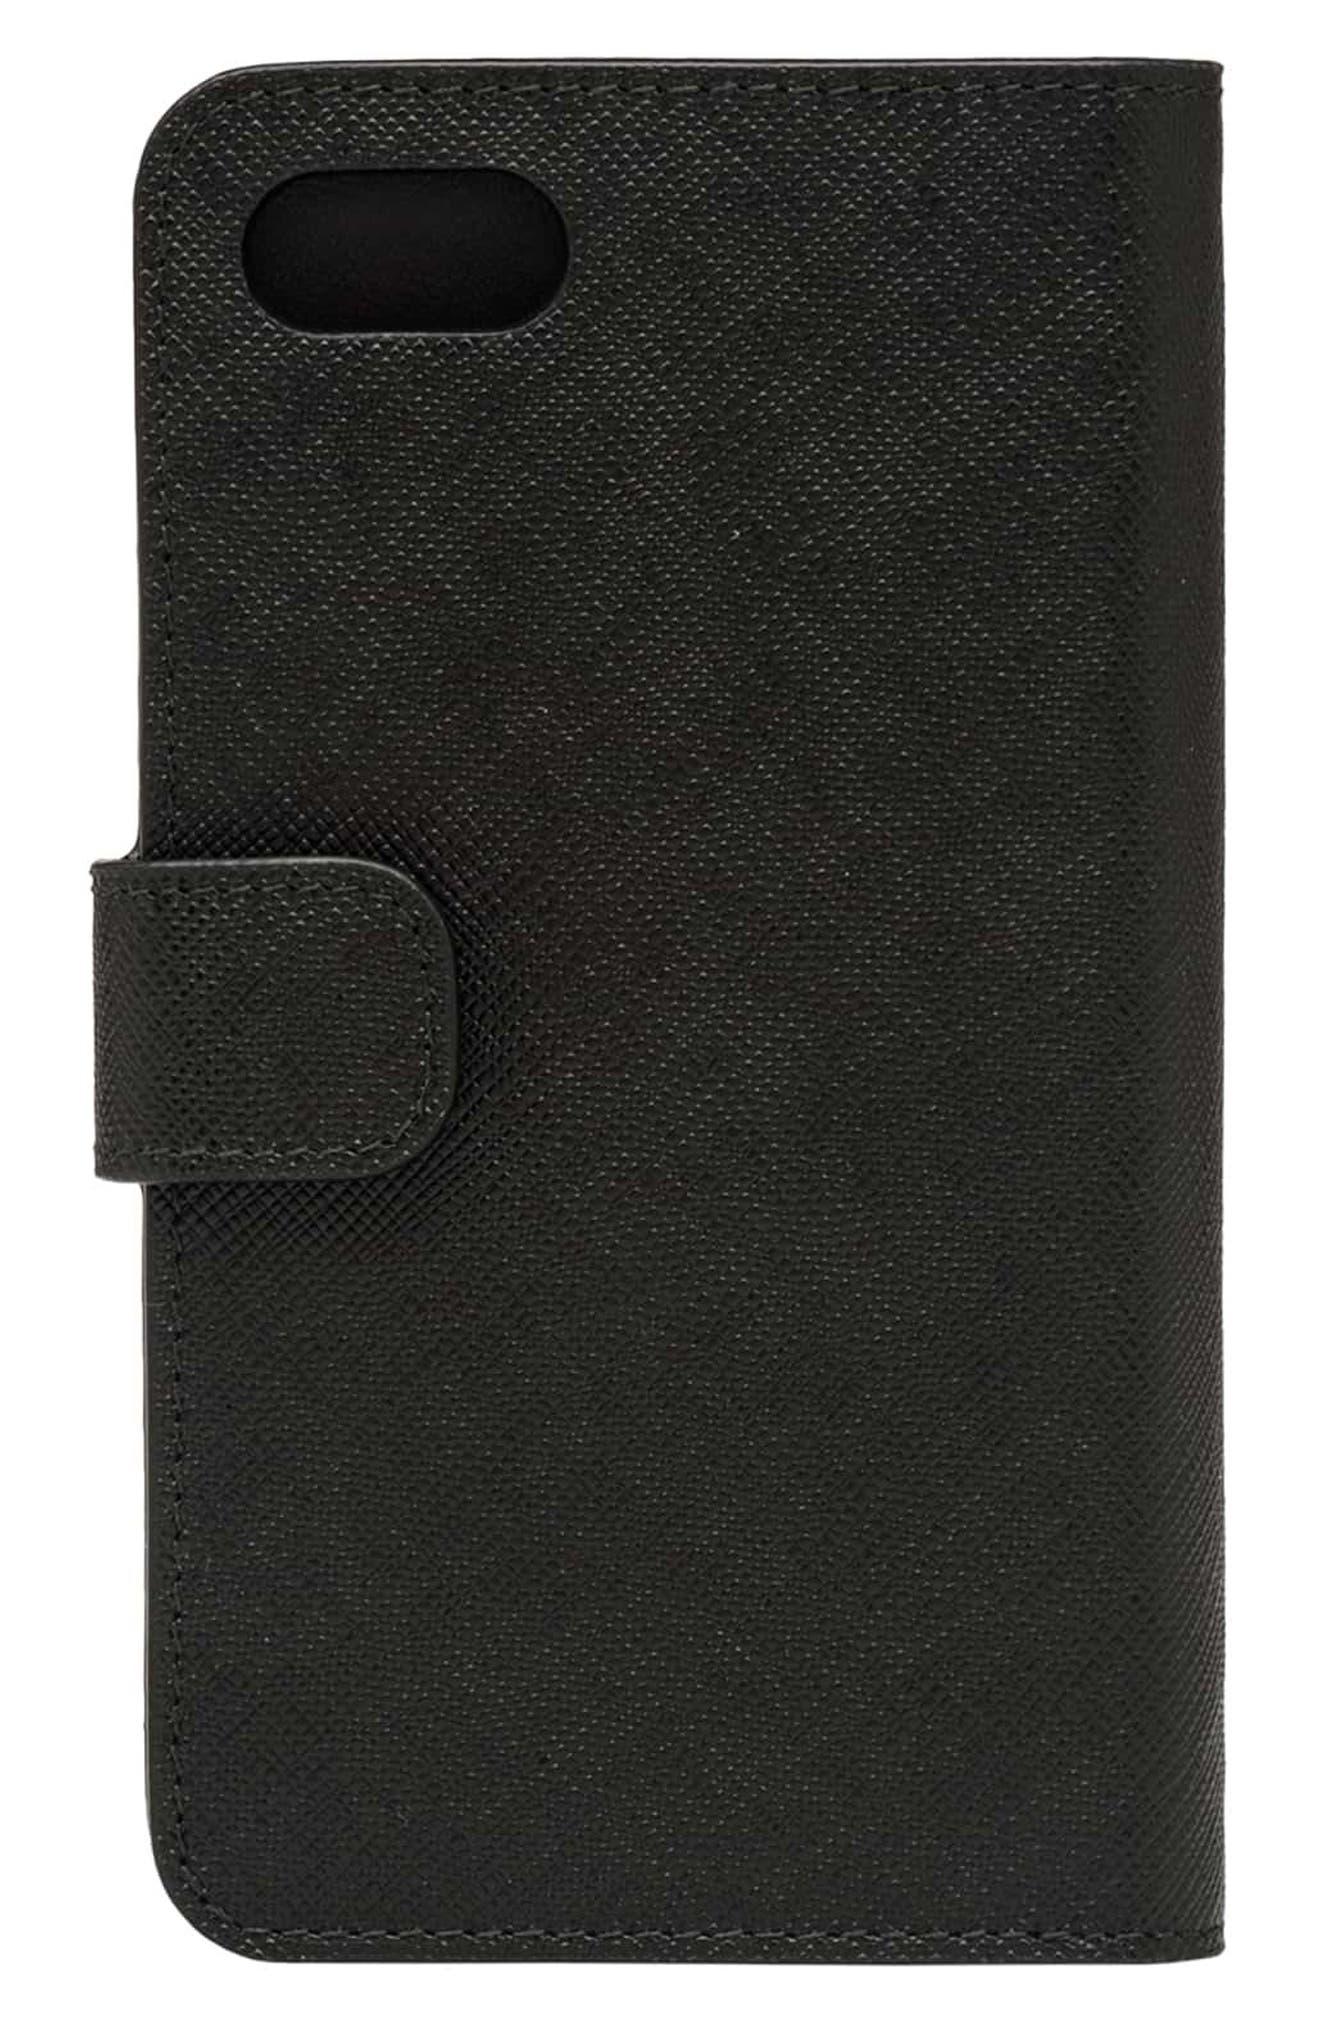 PRADA, Saffiano Metal Oro Chain Book Phone Wallet, Alternate thumbnail 3, color, 001